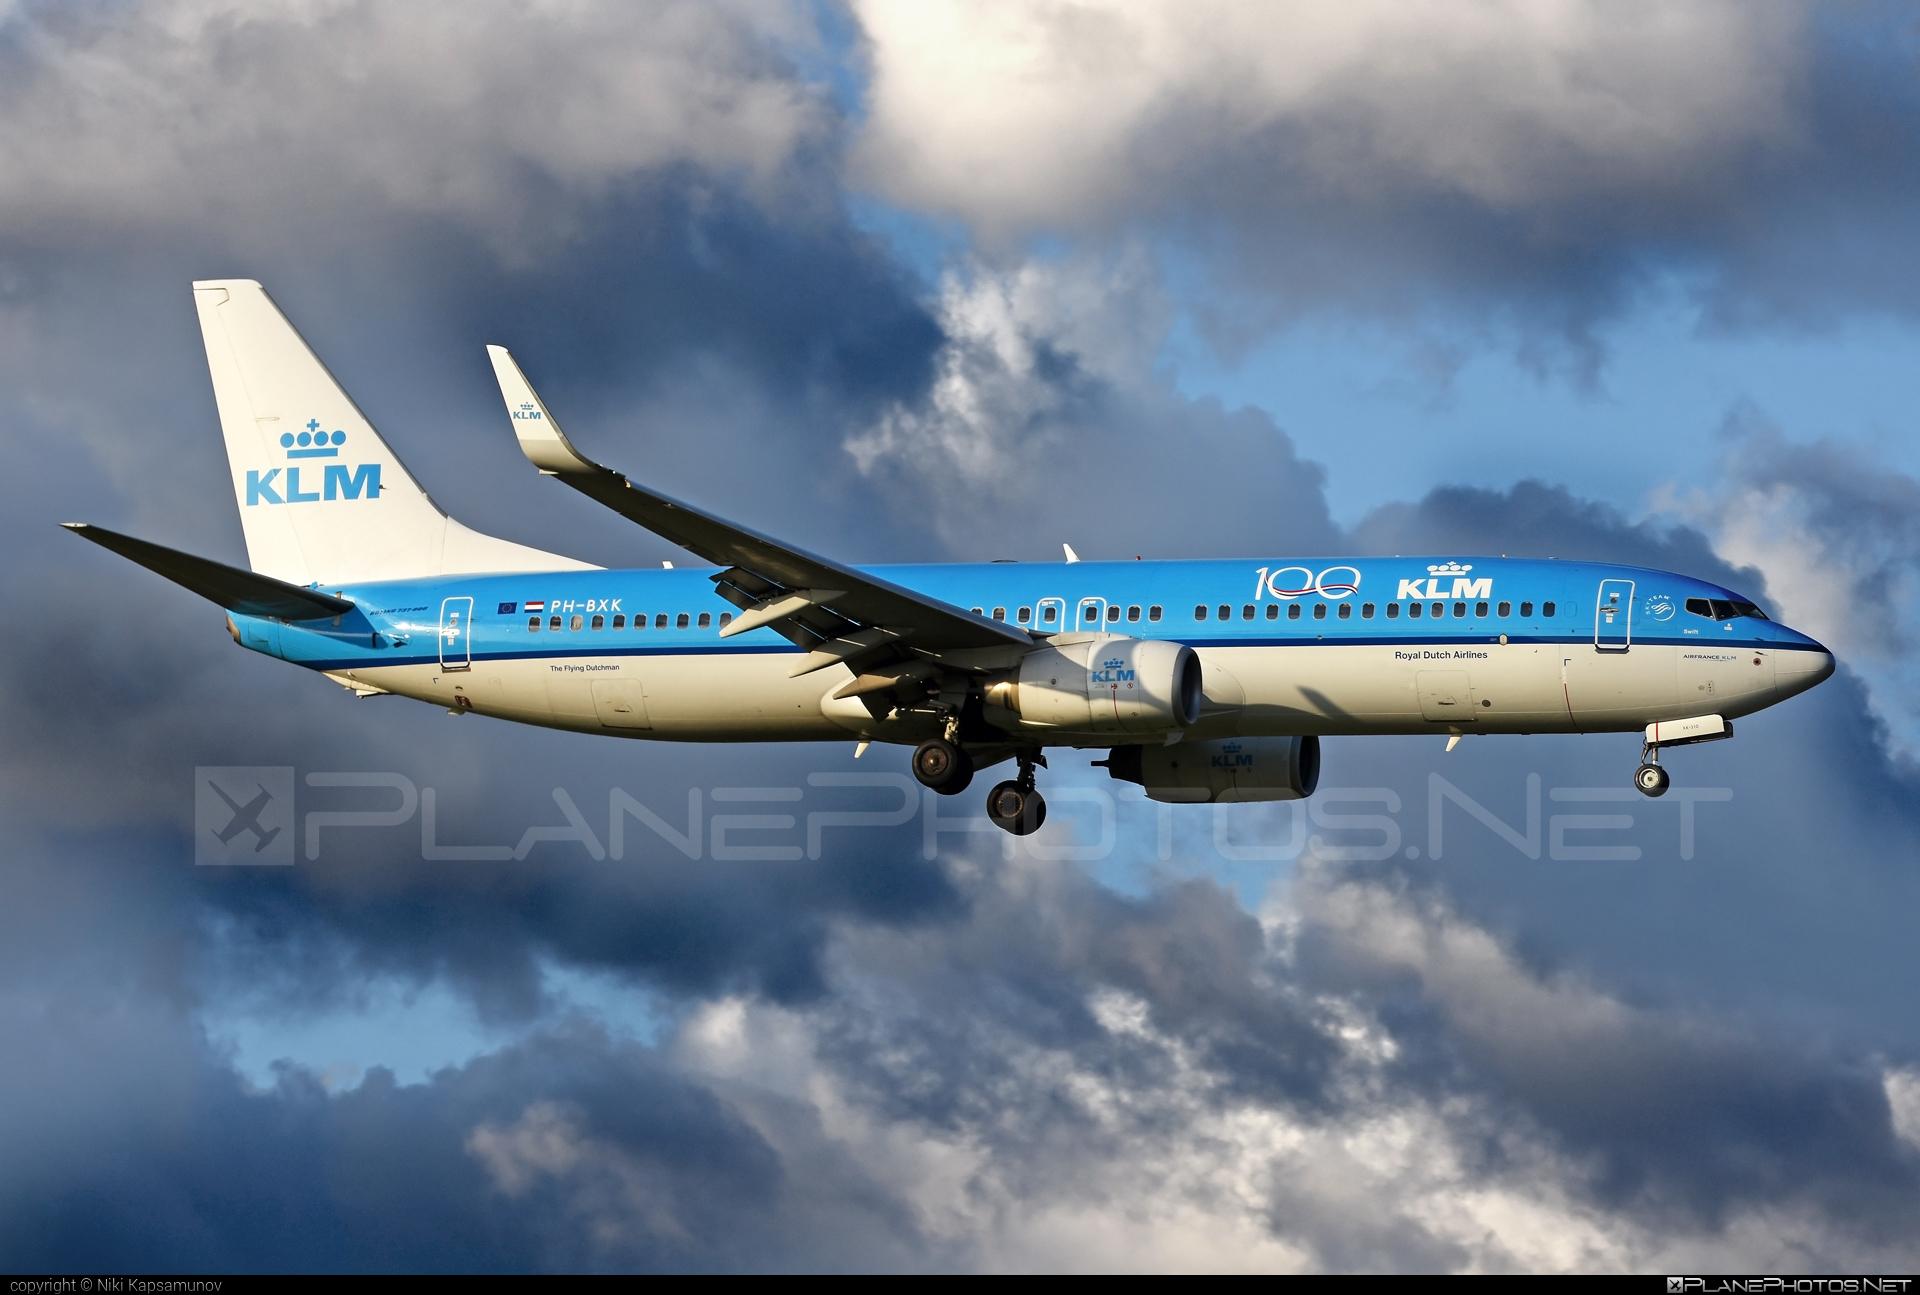 Boeing 737-800 - PH-BXK operated by KLM Royal Dutch Airlines #b737 #b737nextgen #b737ng #boeing #boeing737 #klm #klmroyaldutchairlines #royaldutchairlines